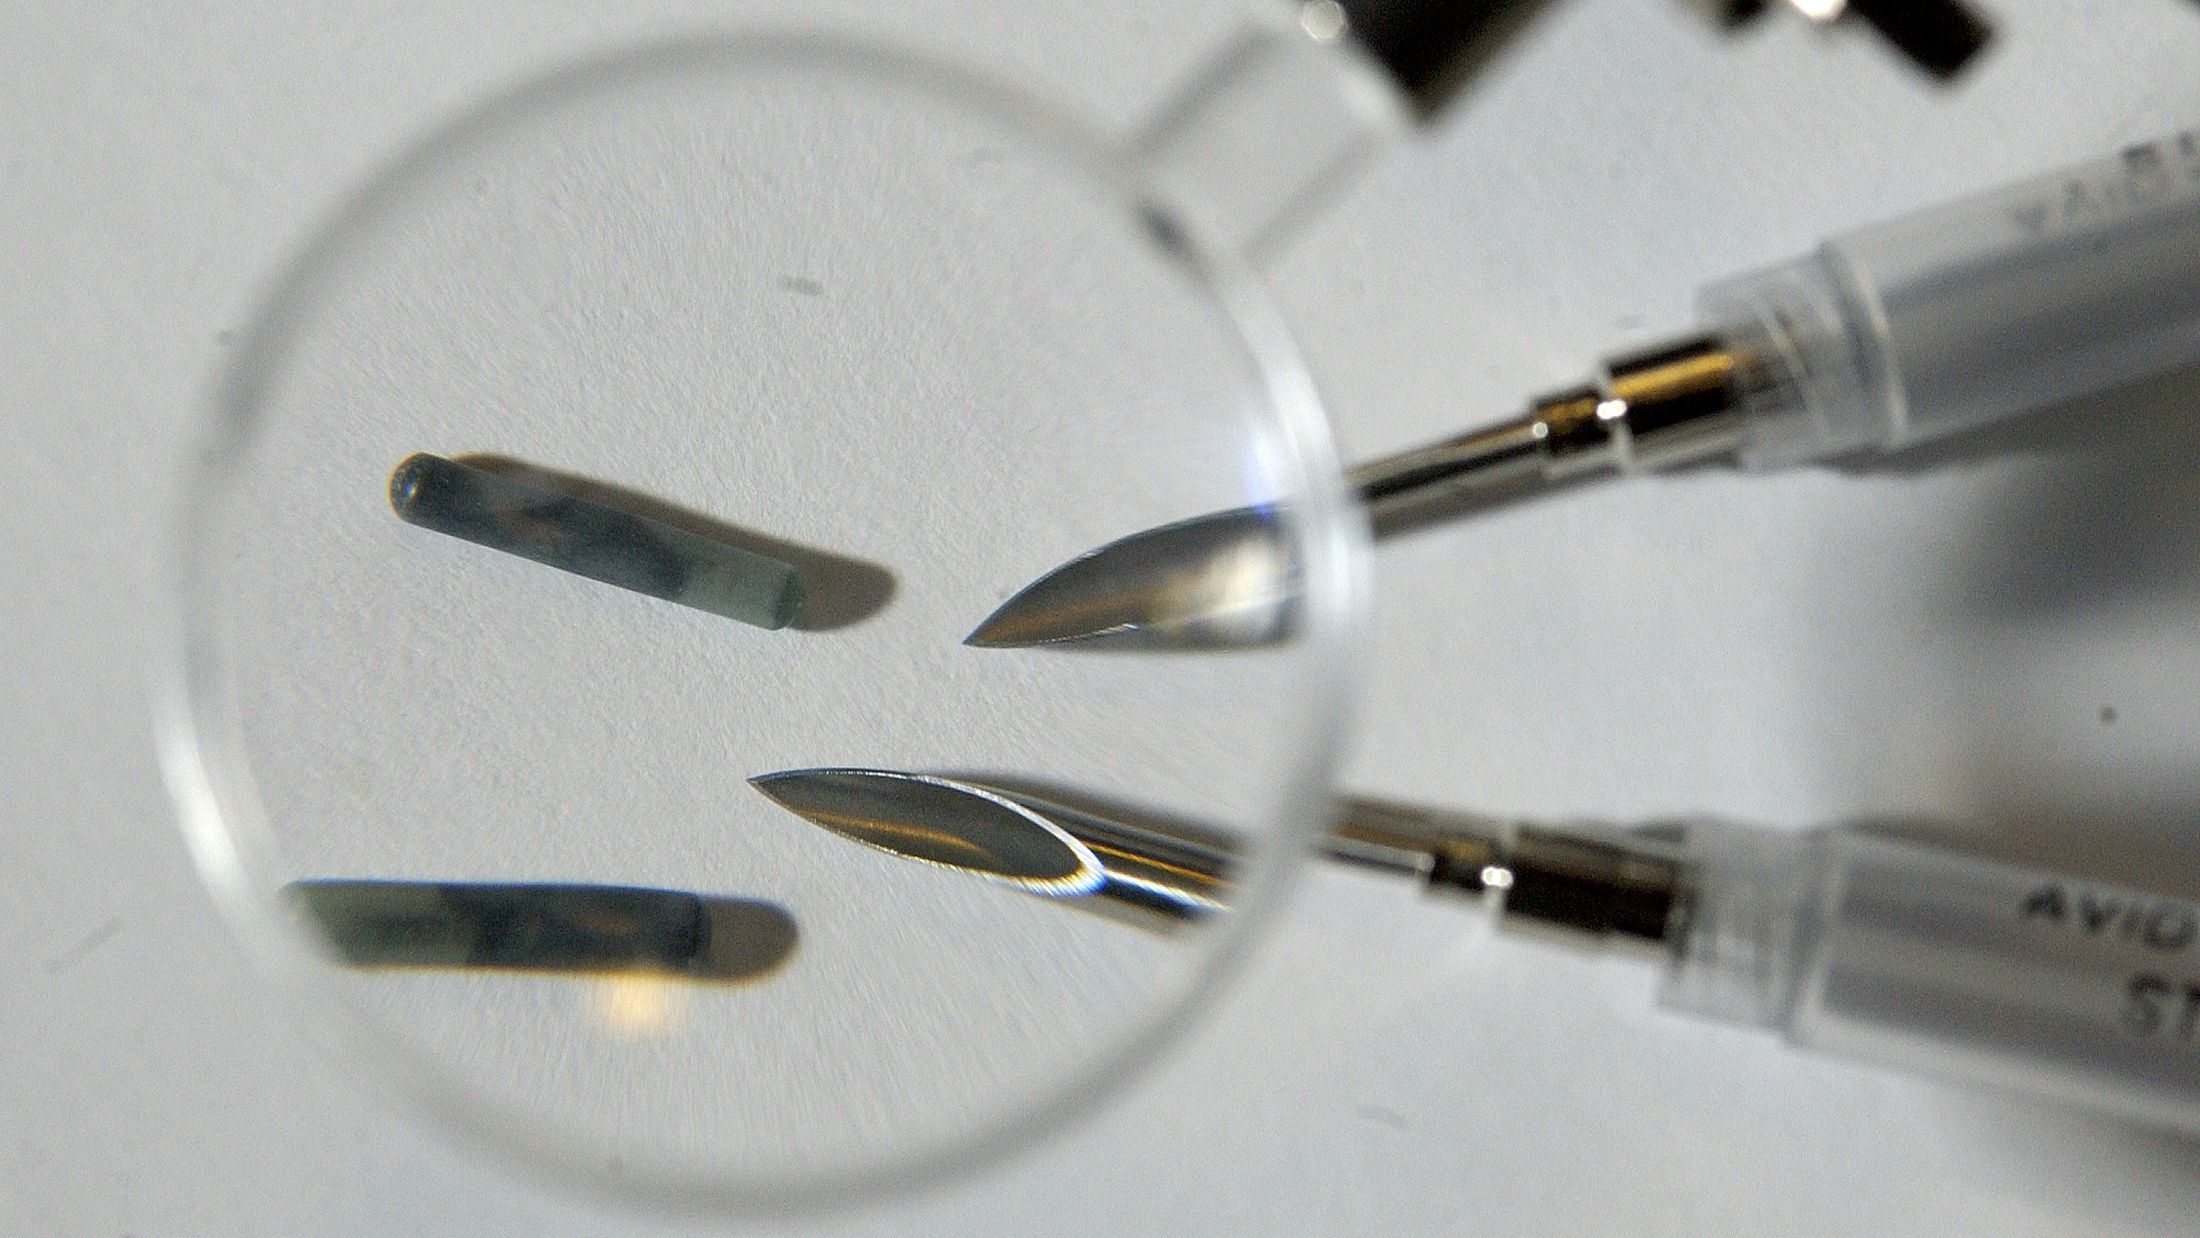 magnifying glass tech microchip computer